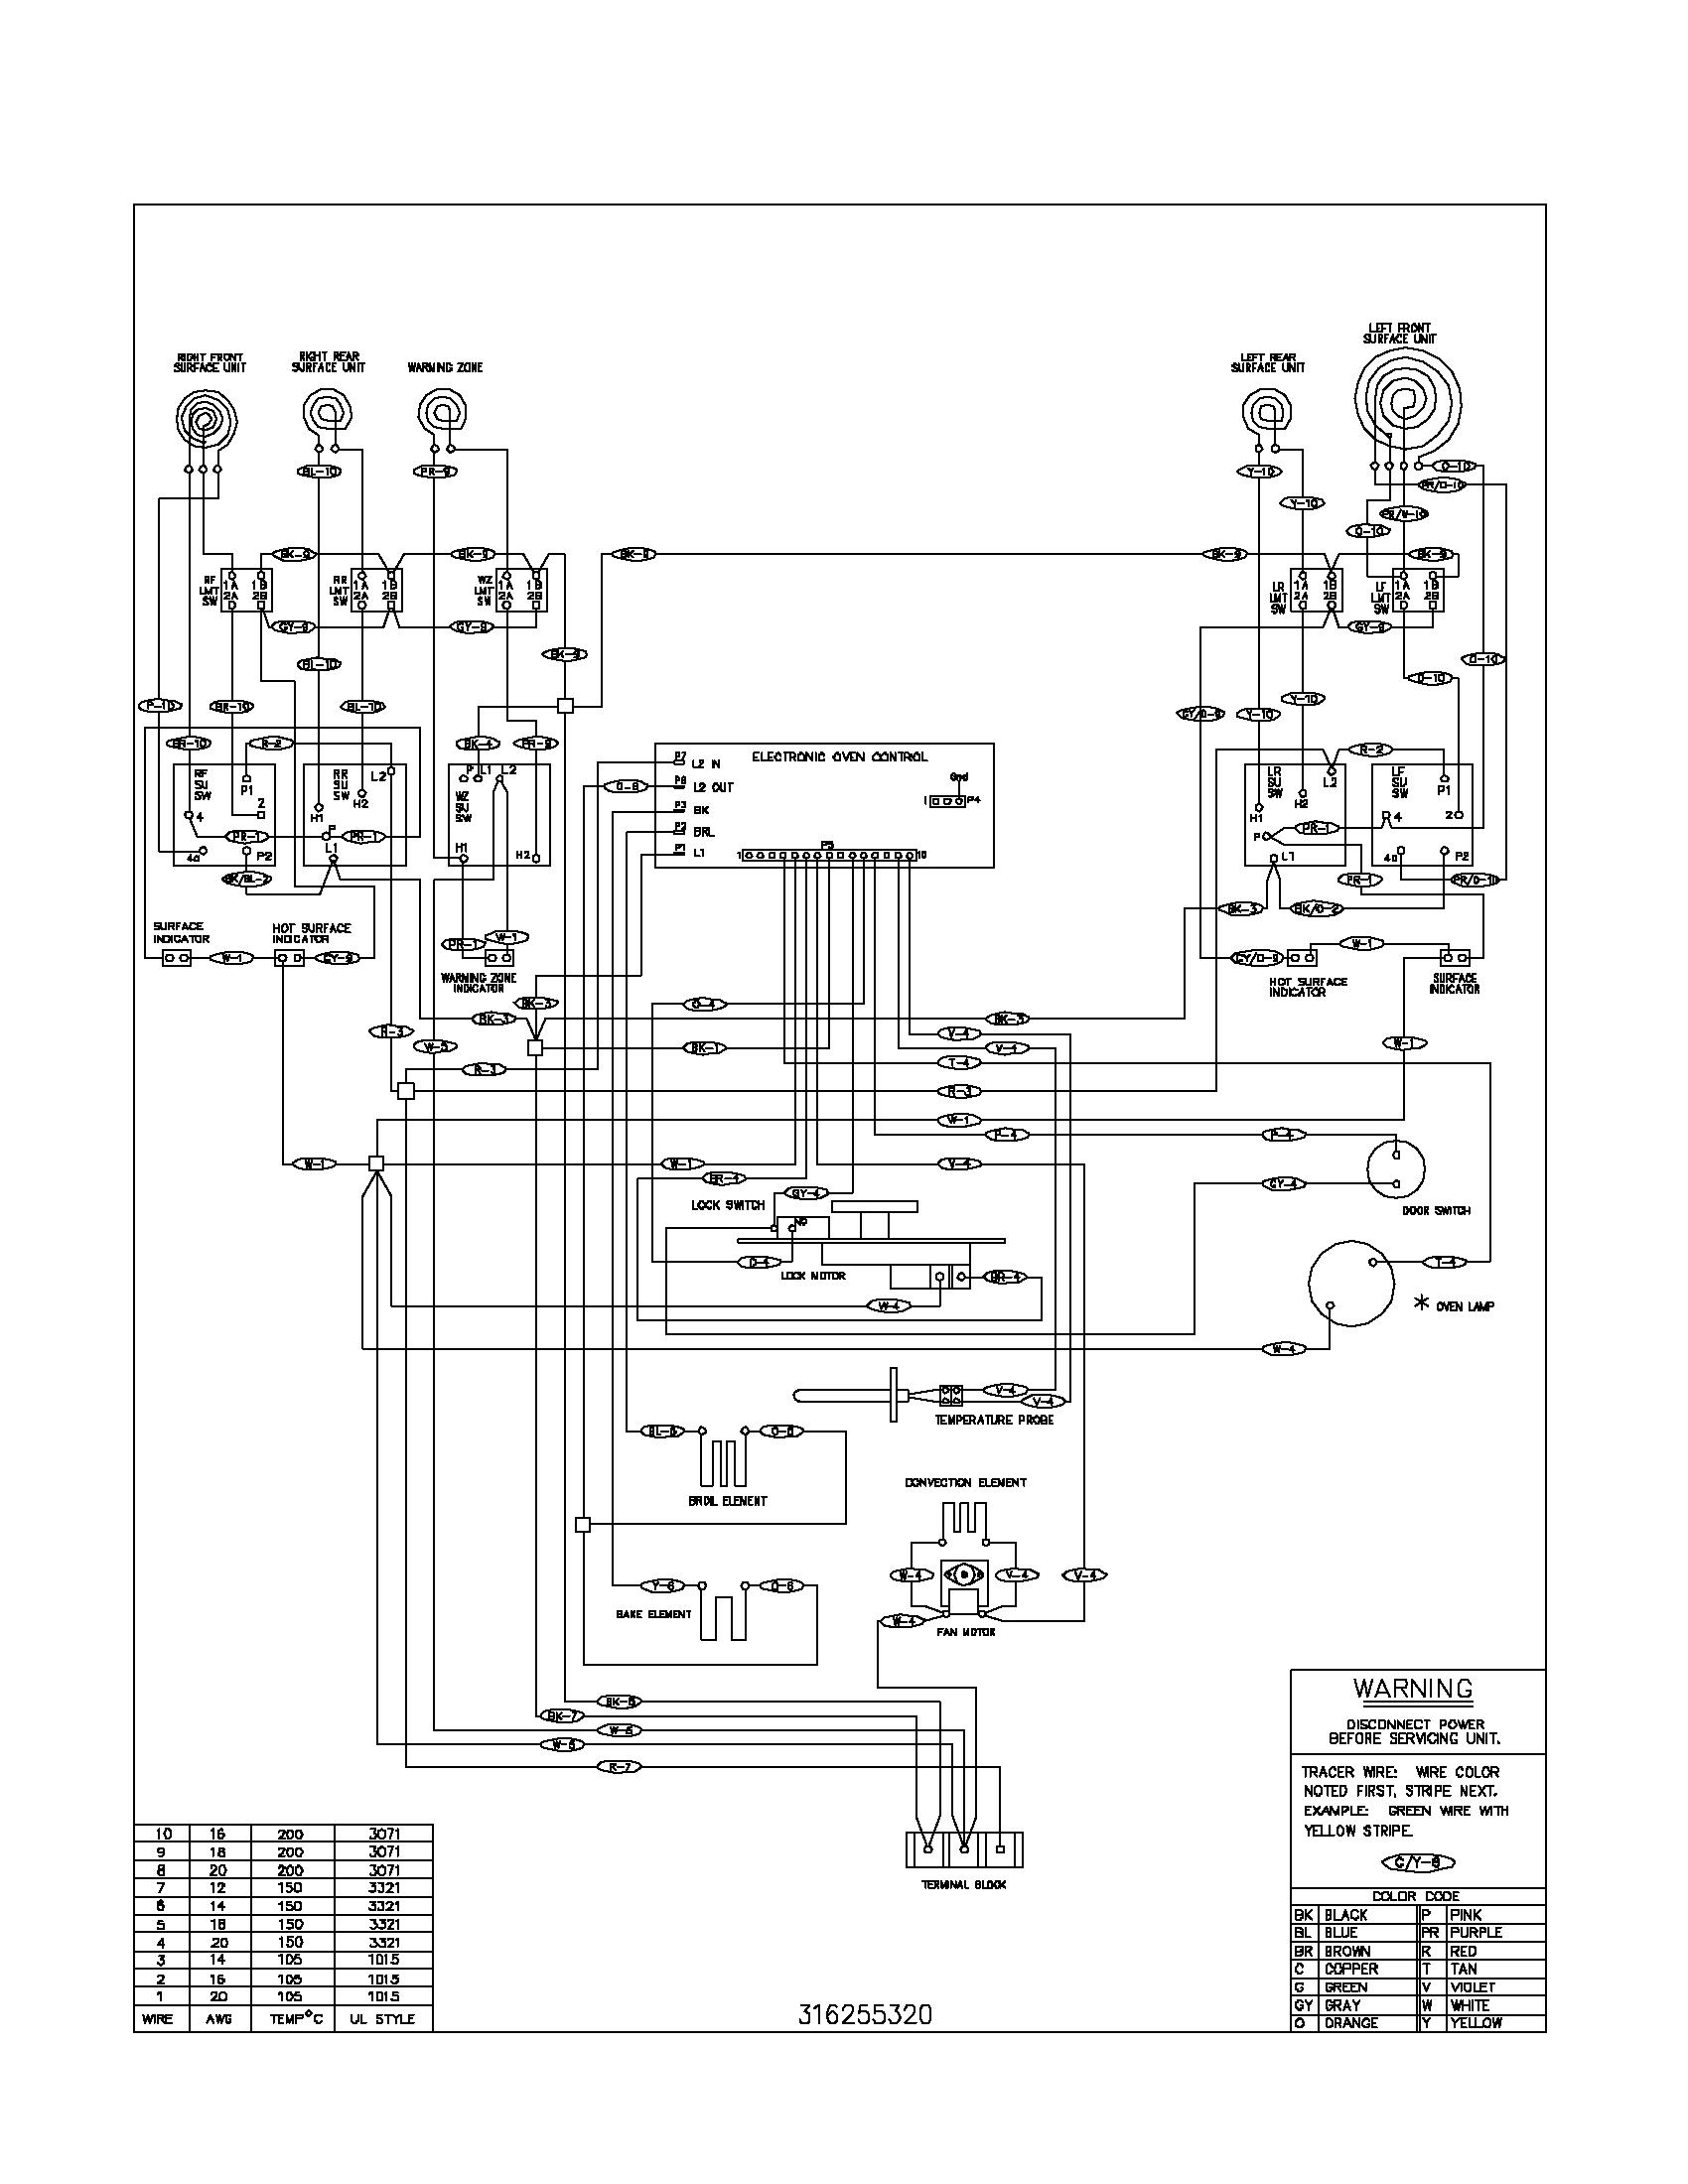 06 jeep commander fuse box diagram